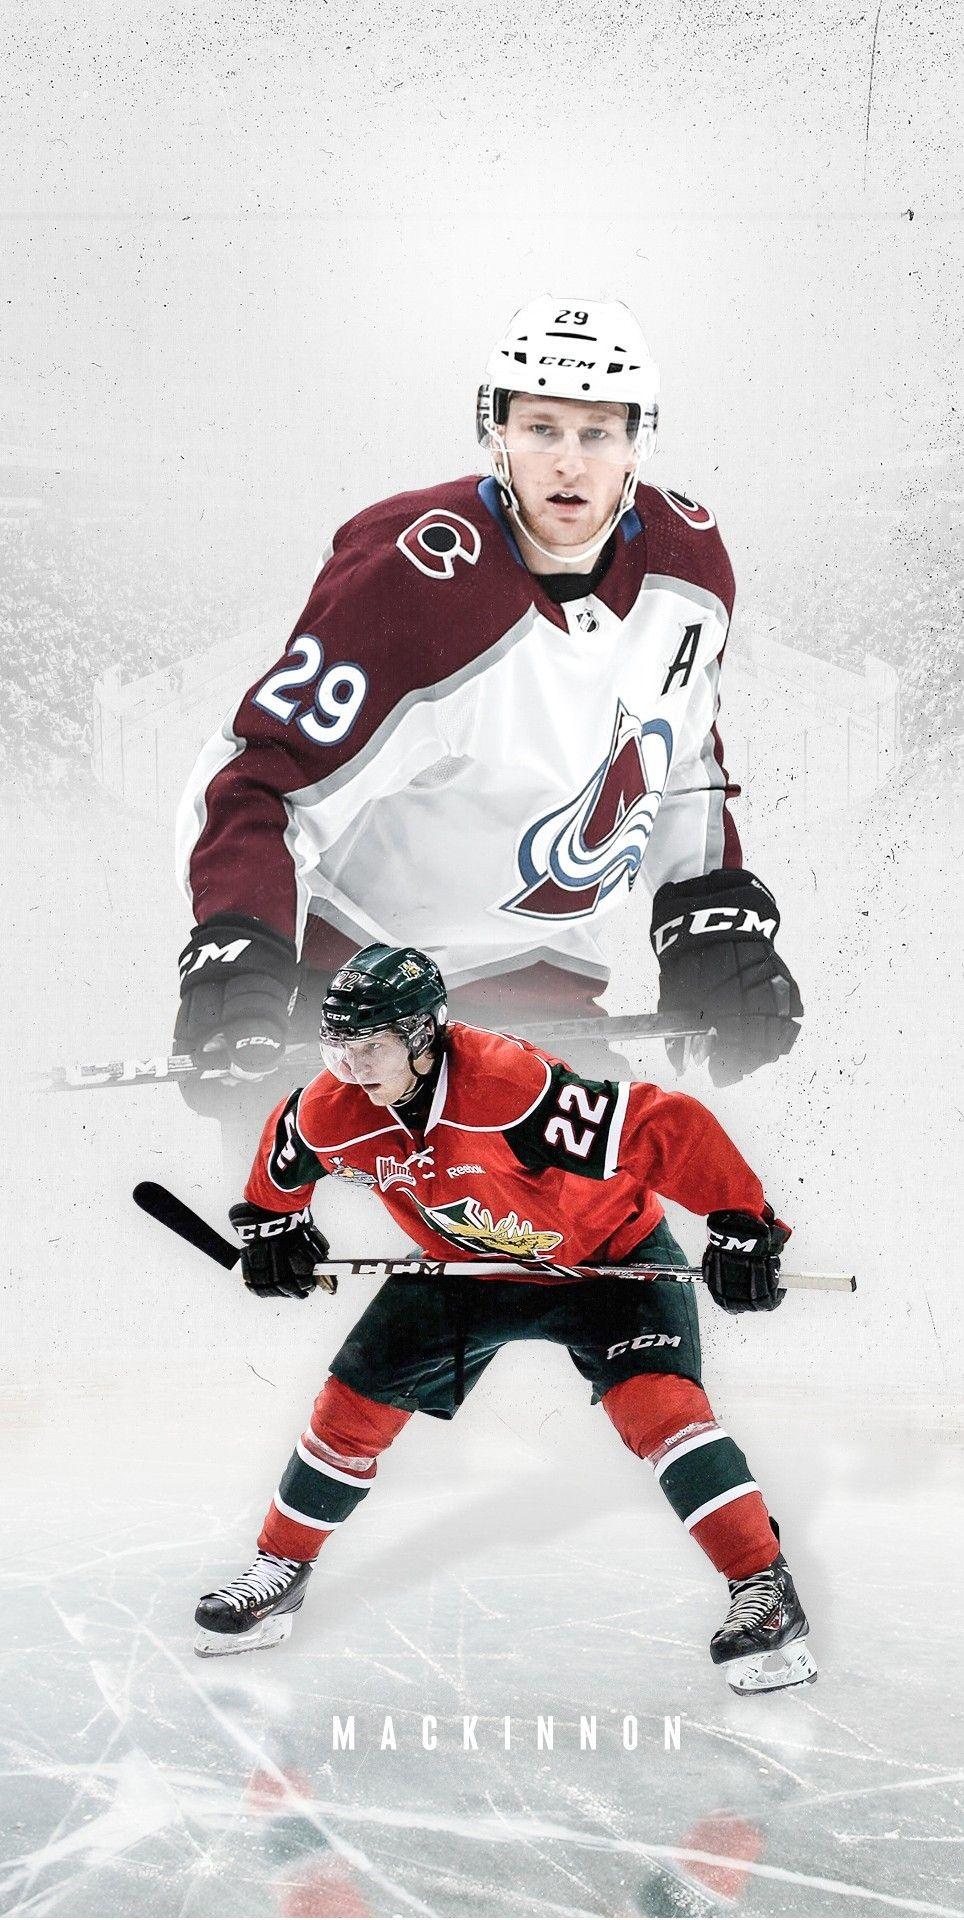 Pin By Andre Donadio On Nathan Mackinnon In 2021 Colorado Avalanche Samurai Gear Hockey